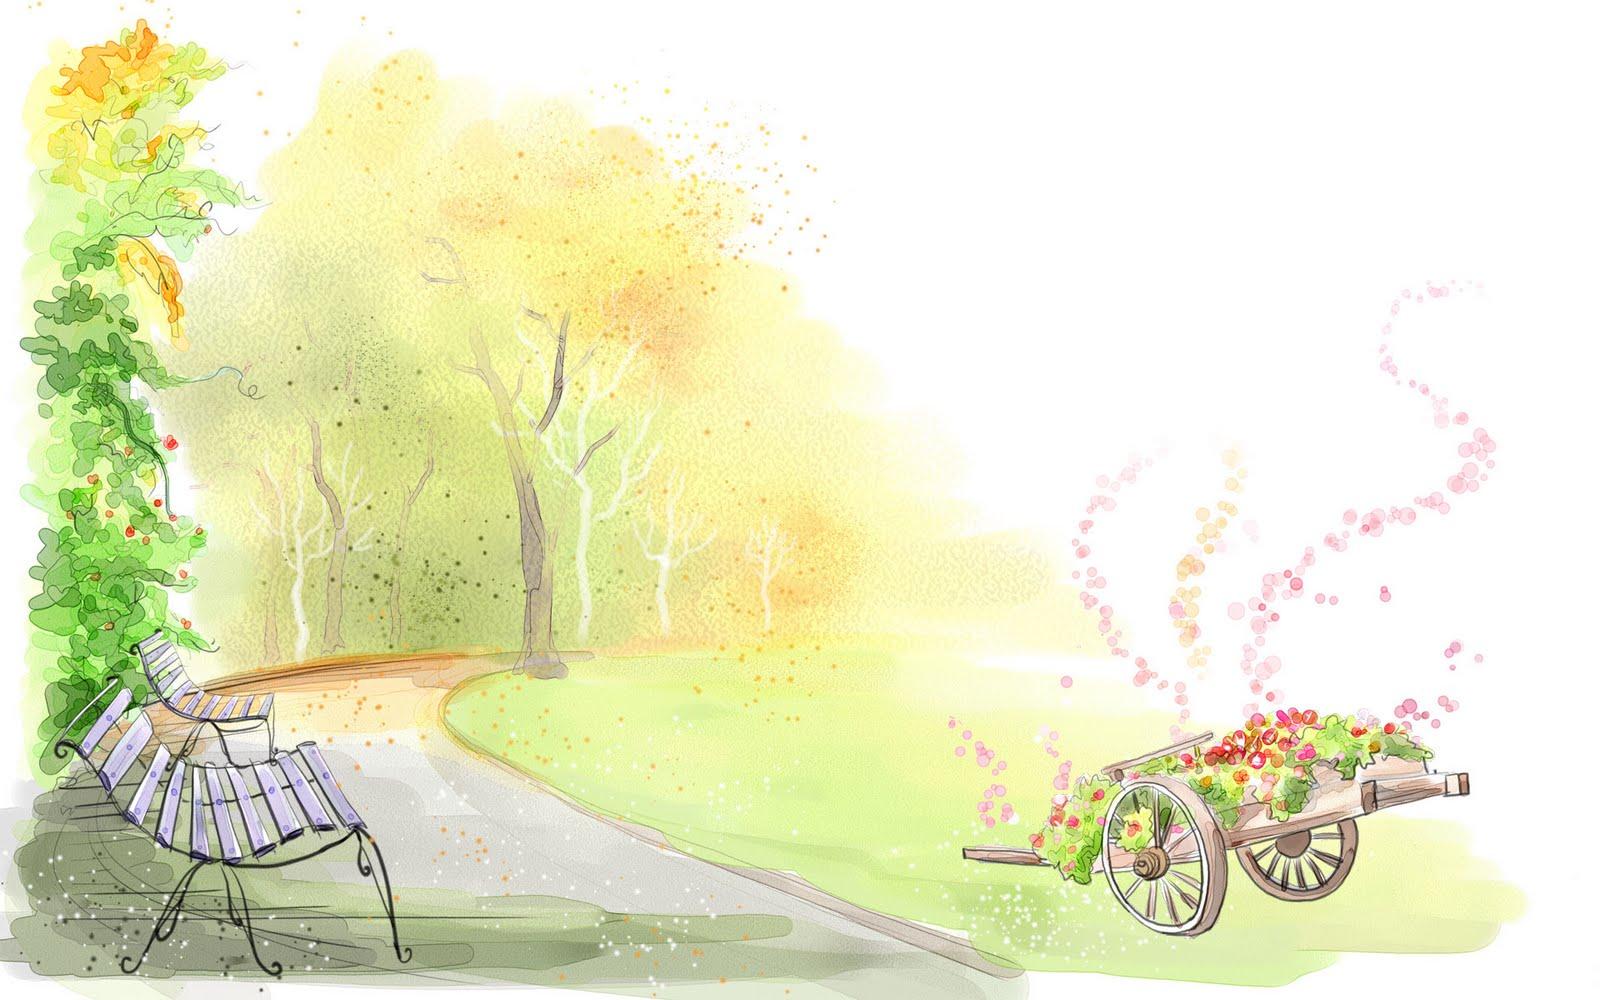 http://3.bp.blogspot.com/_0EWrpebzbIA/S_xCeqsW9vI/AAAAAAAAAP8/ih2eo_3jNFM/s1600/digital-art-drawing-wallpaper+(9).jpg